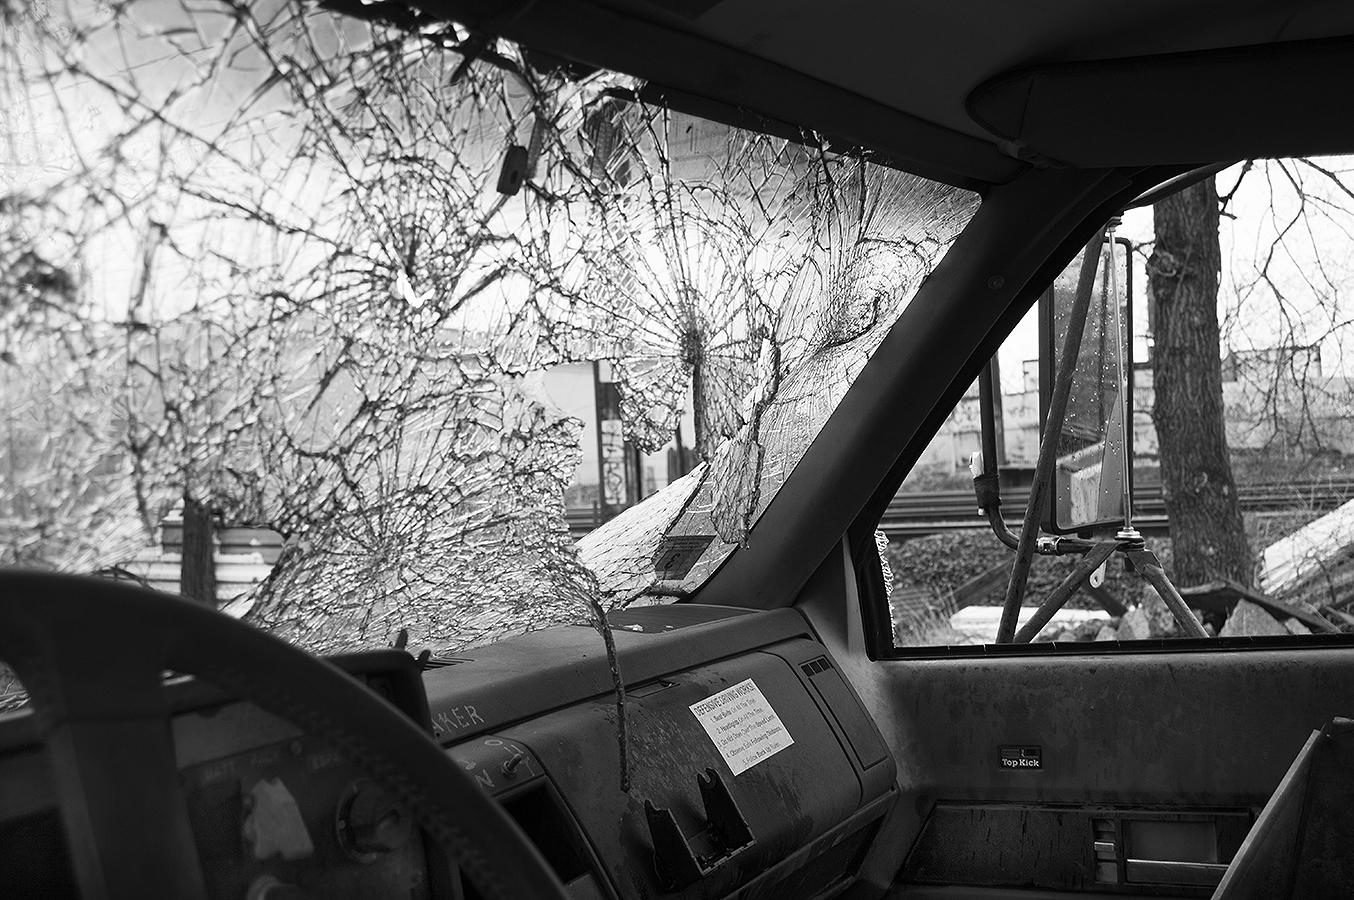 Jasmin_Smoots_Photography_2016_Junk_Yard_Broken_Window_smashed_destroyed_broken